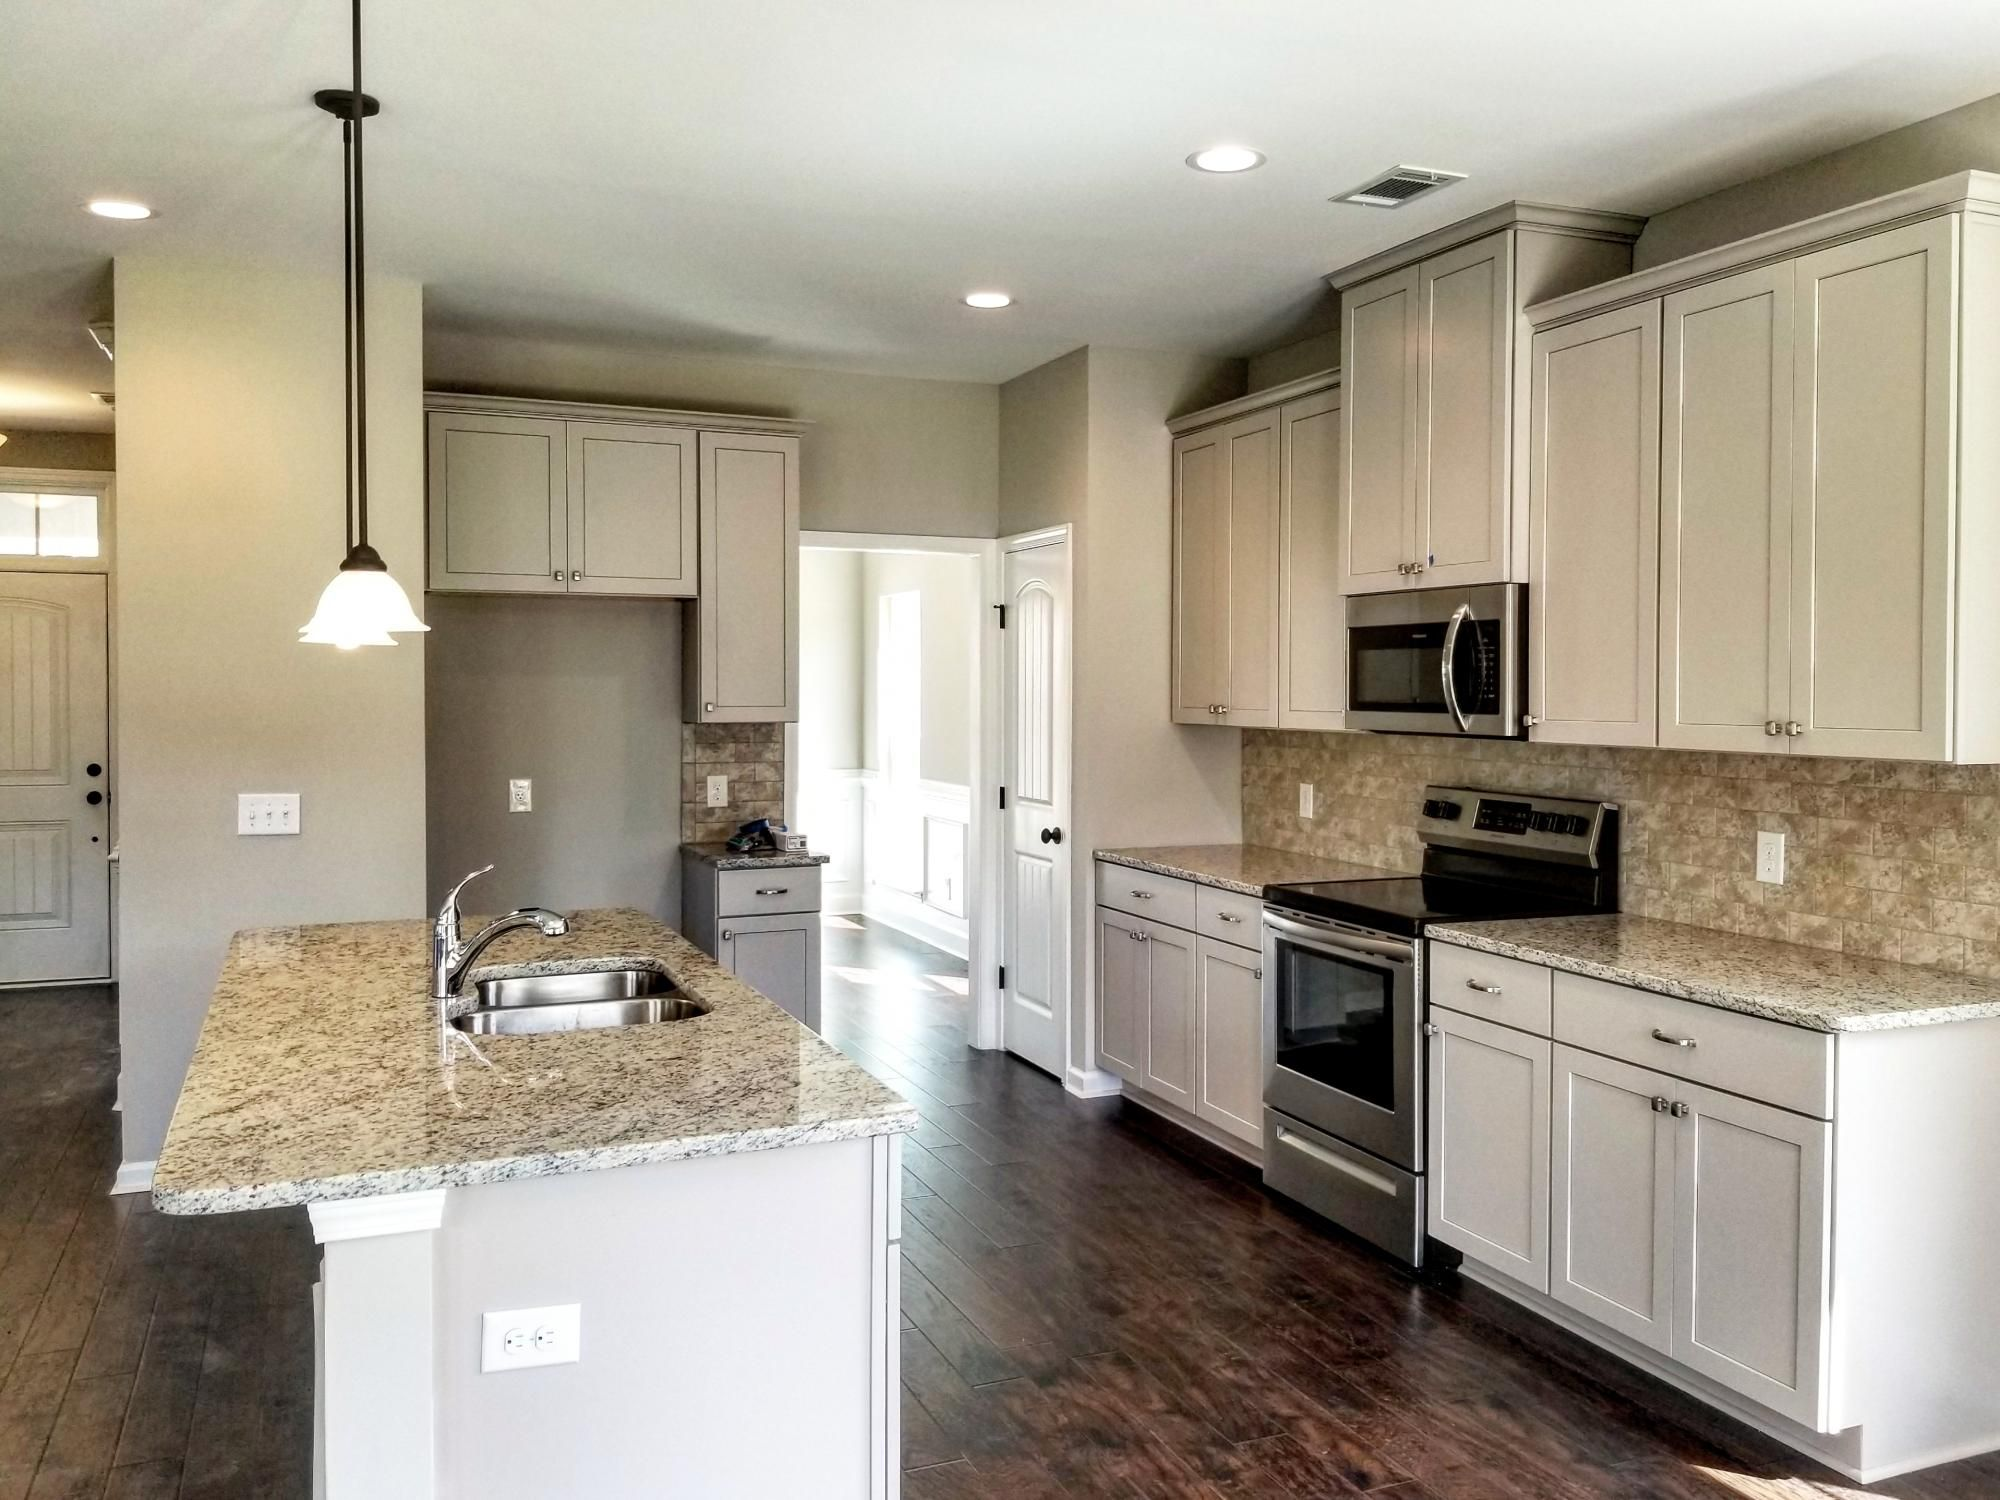 130 Spoonbill Circle New Homes In Savannah Ga Konter Quality Homes New Homes Home House Design